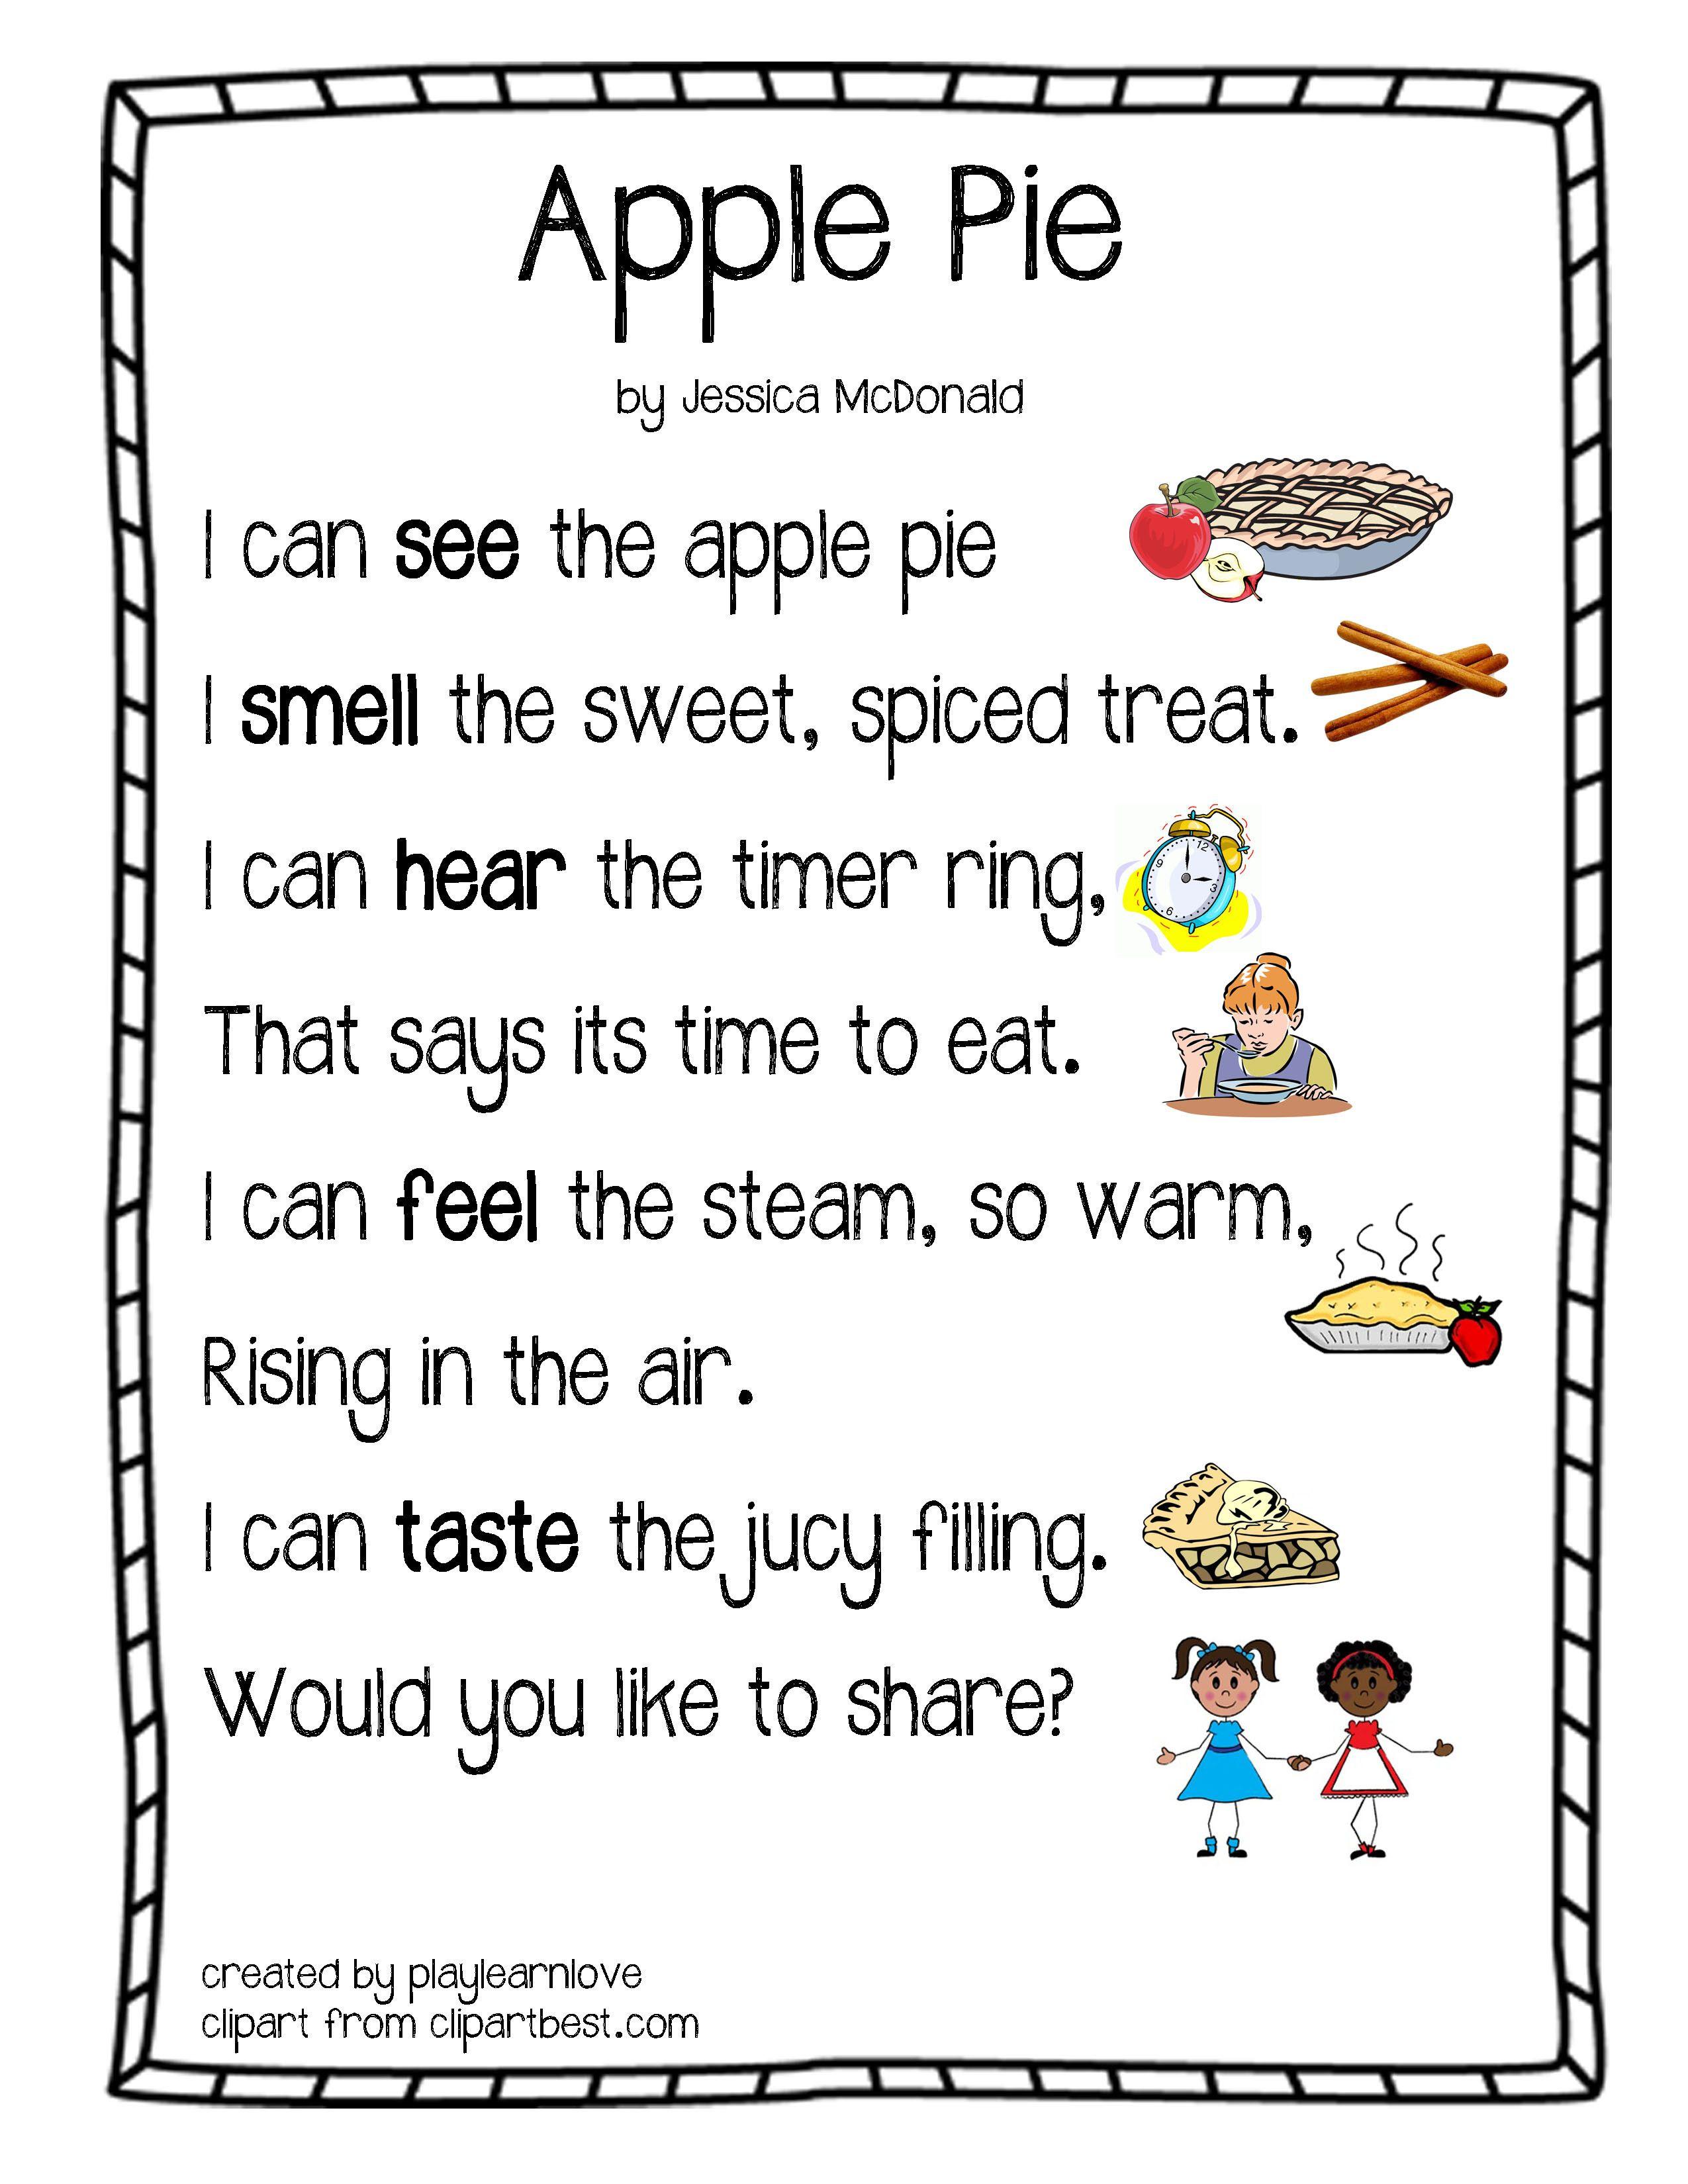 Apple Pie Five Senses Poem